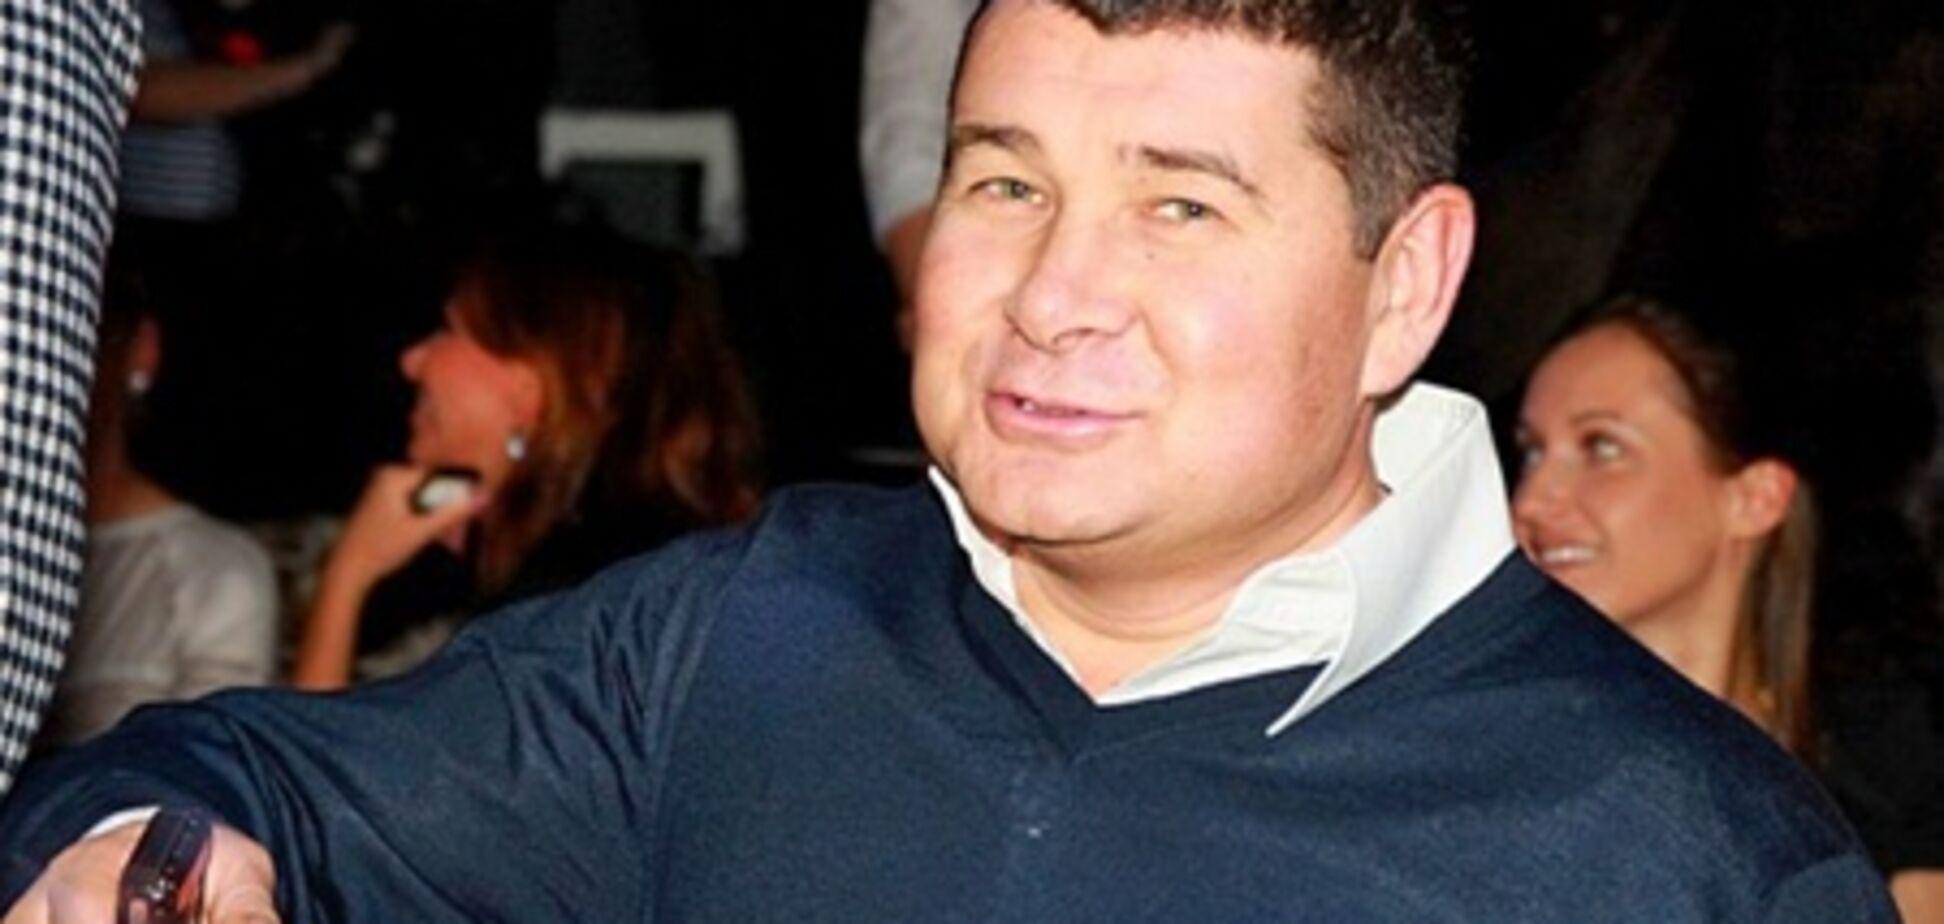 Депутата-новичка Онищенко научили давить на кнопки